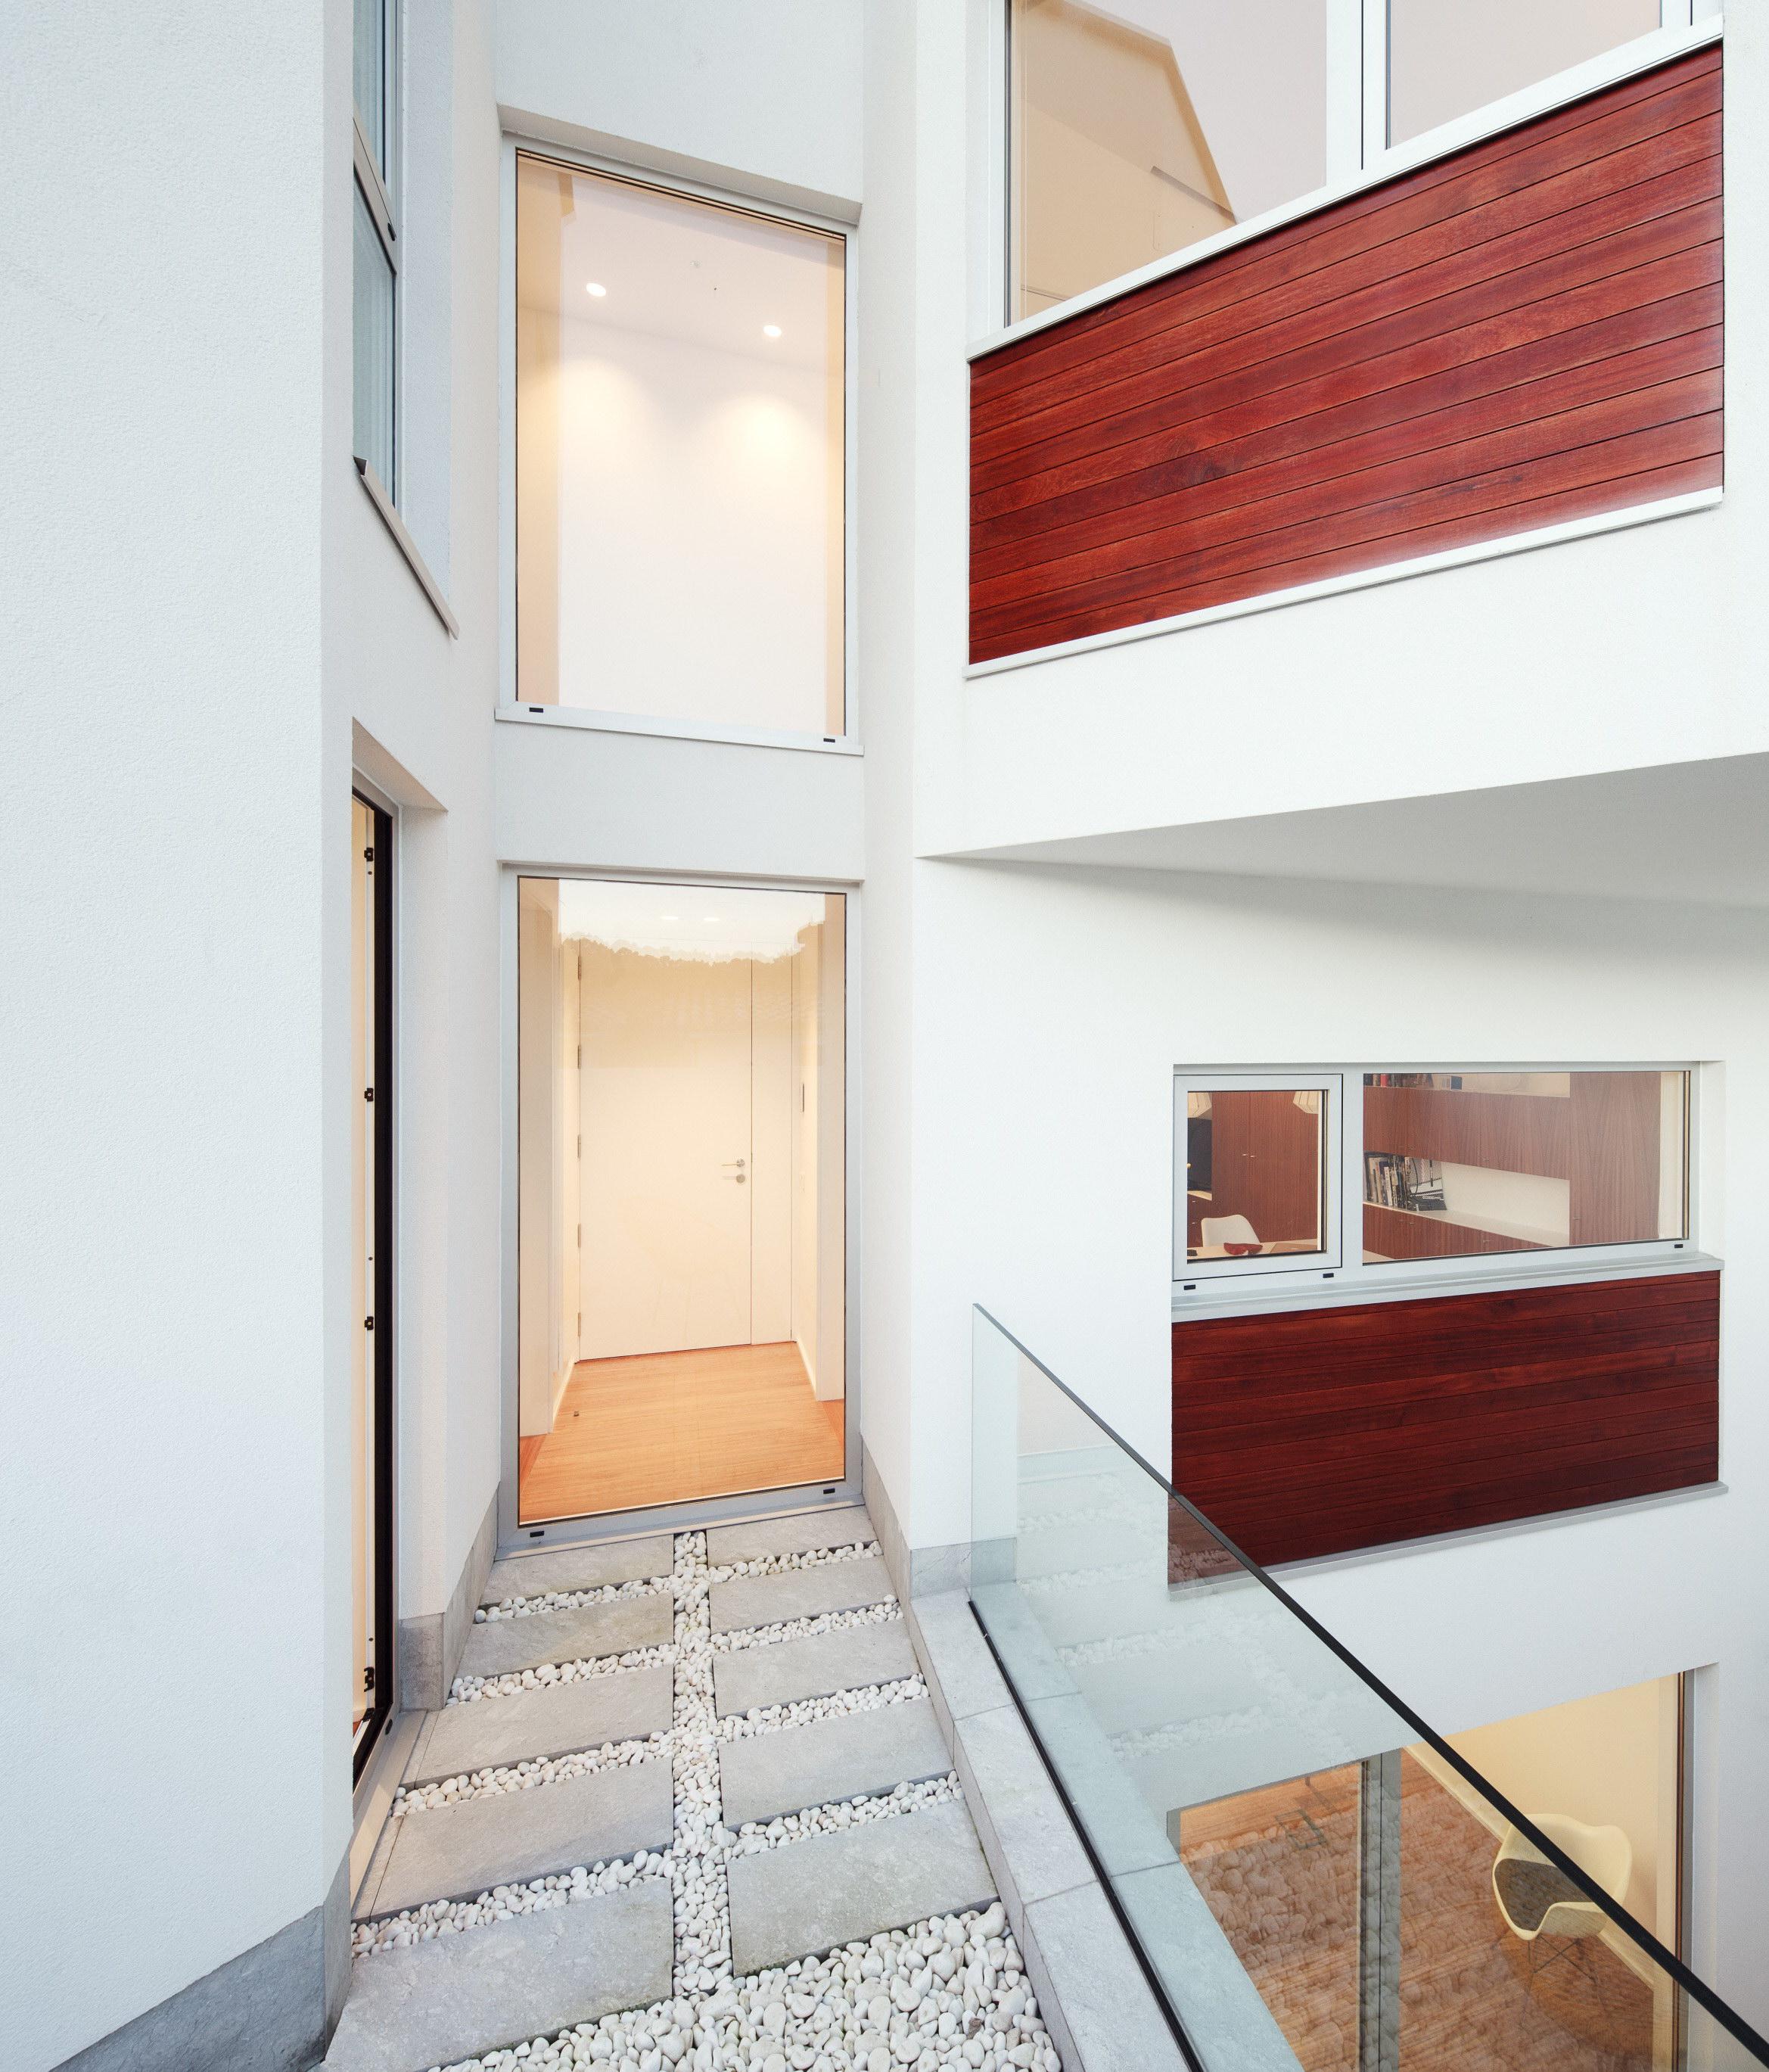 Casa AJ by OmasC arquitectos